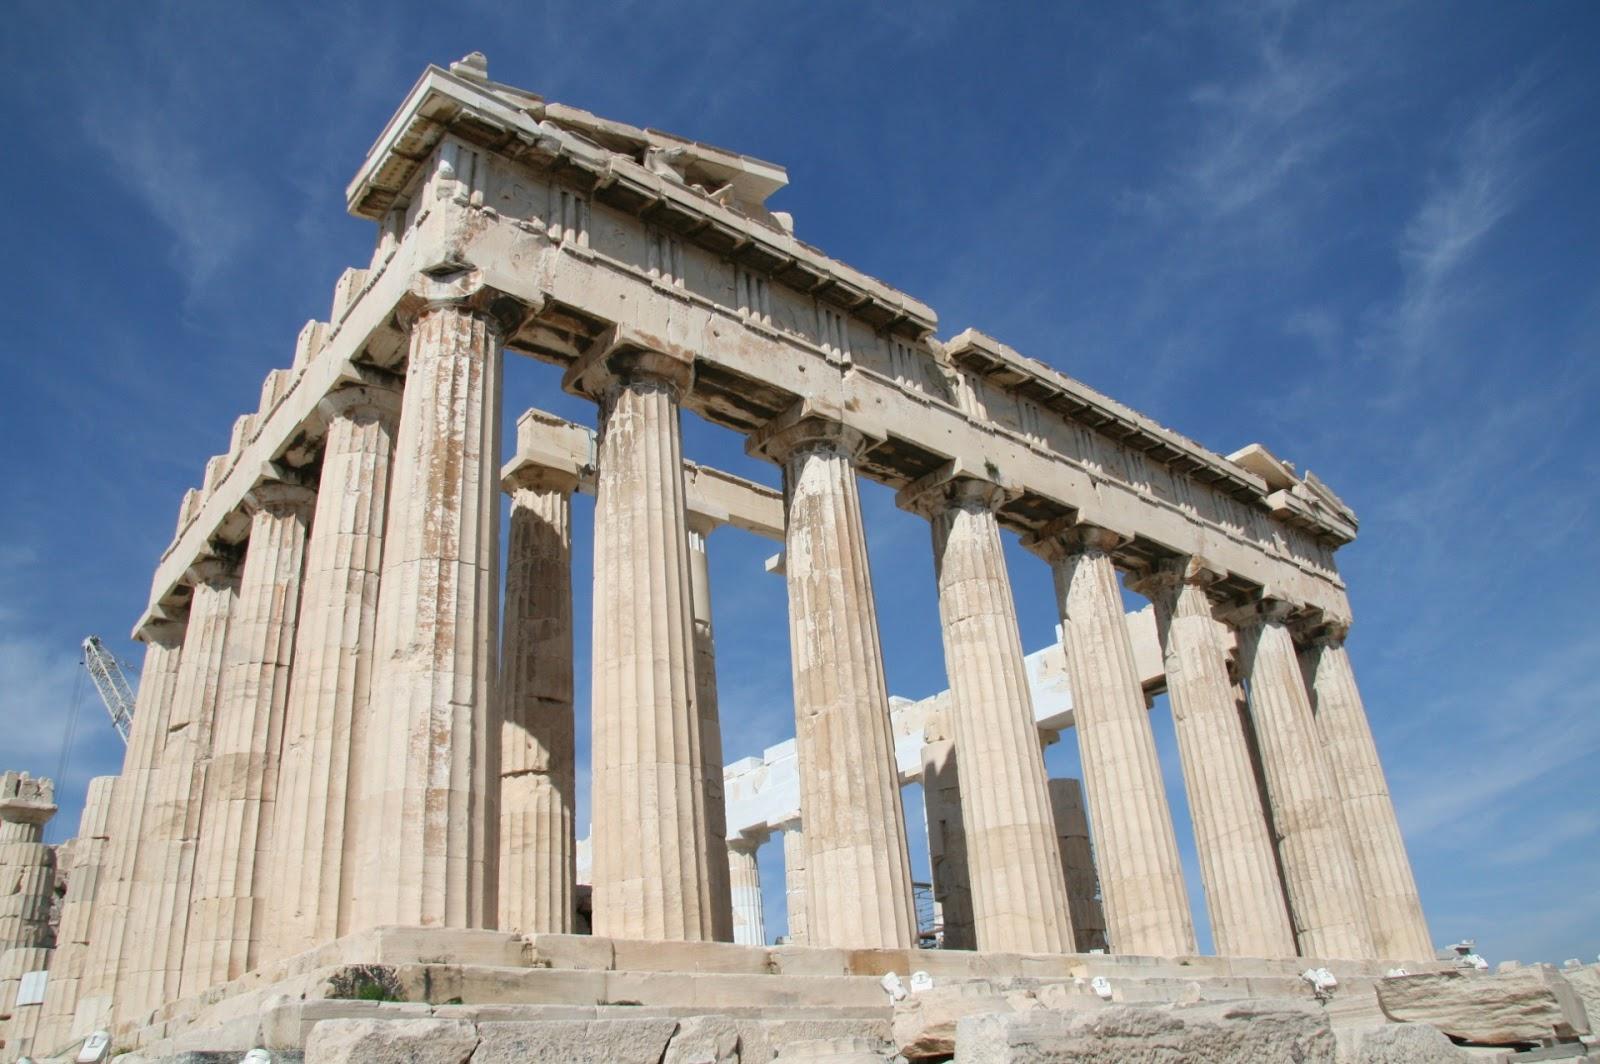 athens-greece-acropolis-1392621686jhj.jpg